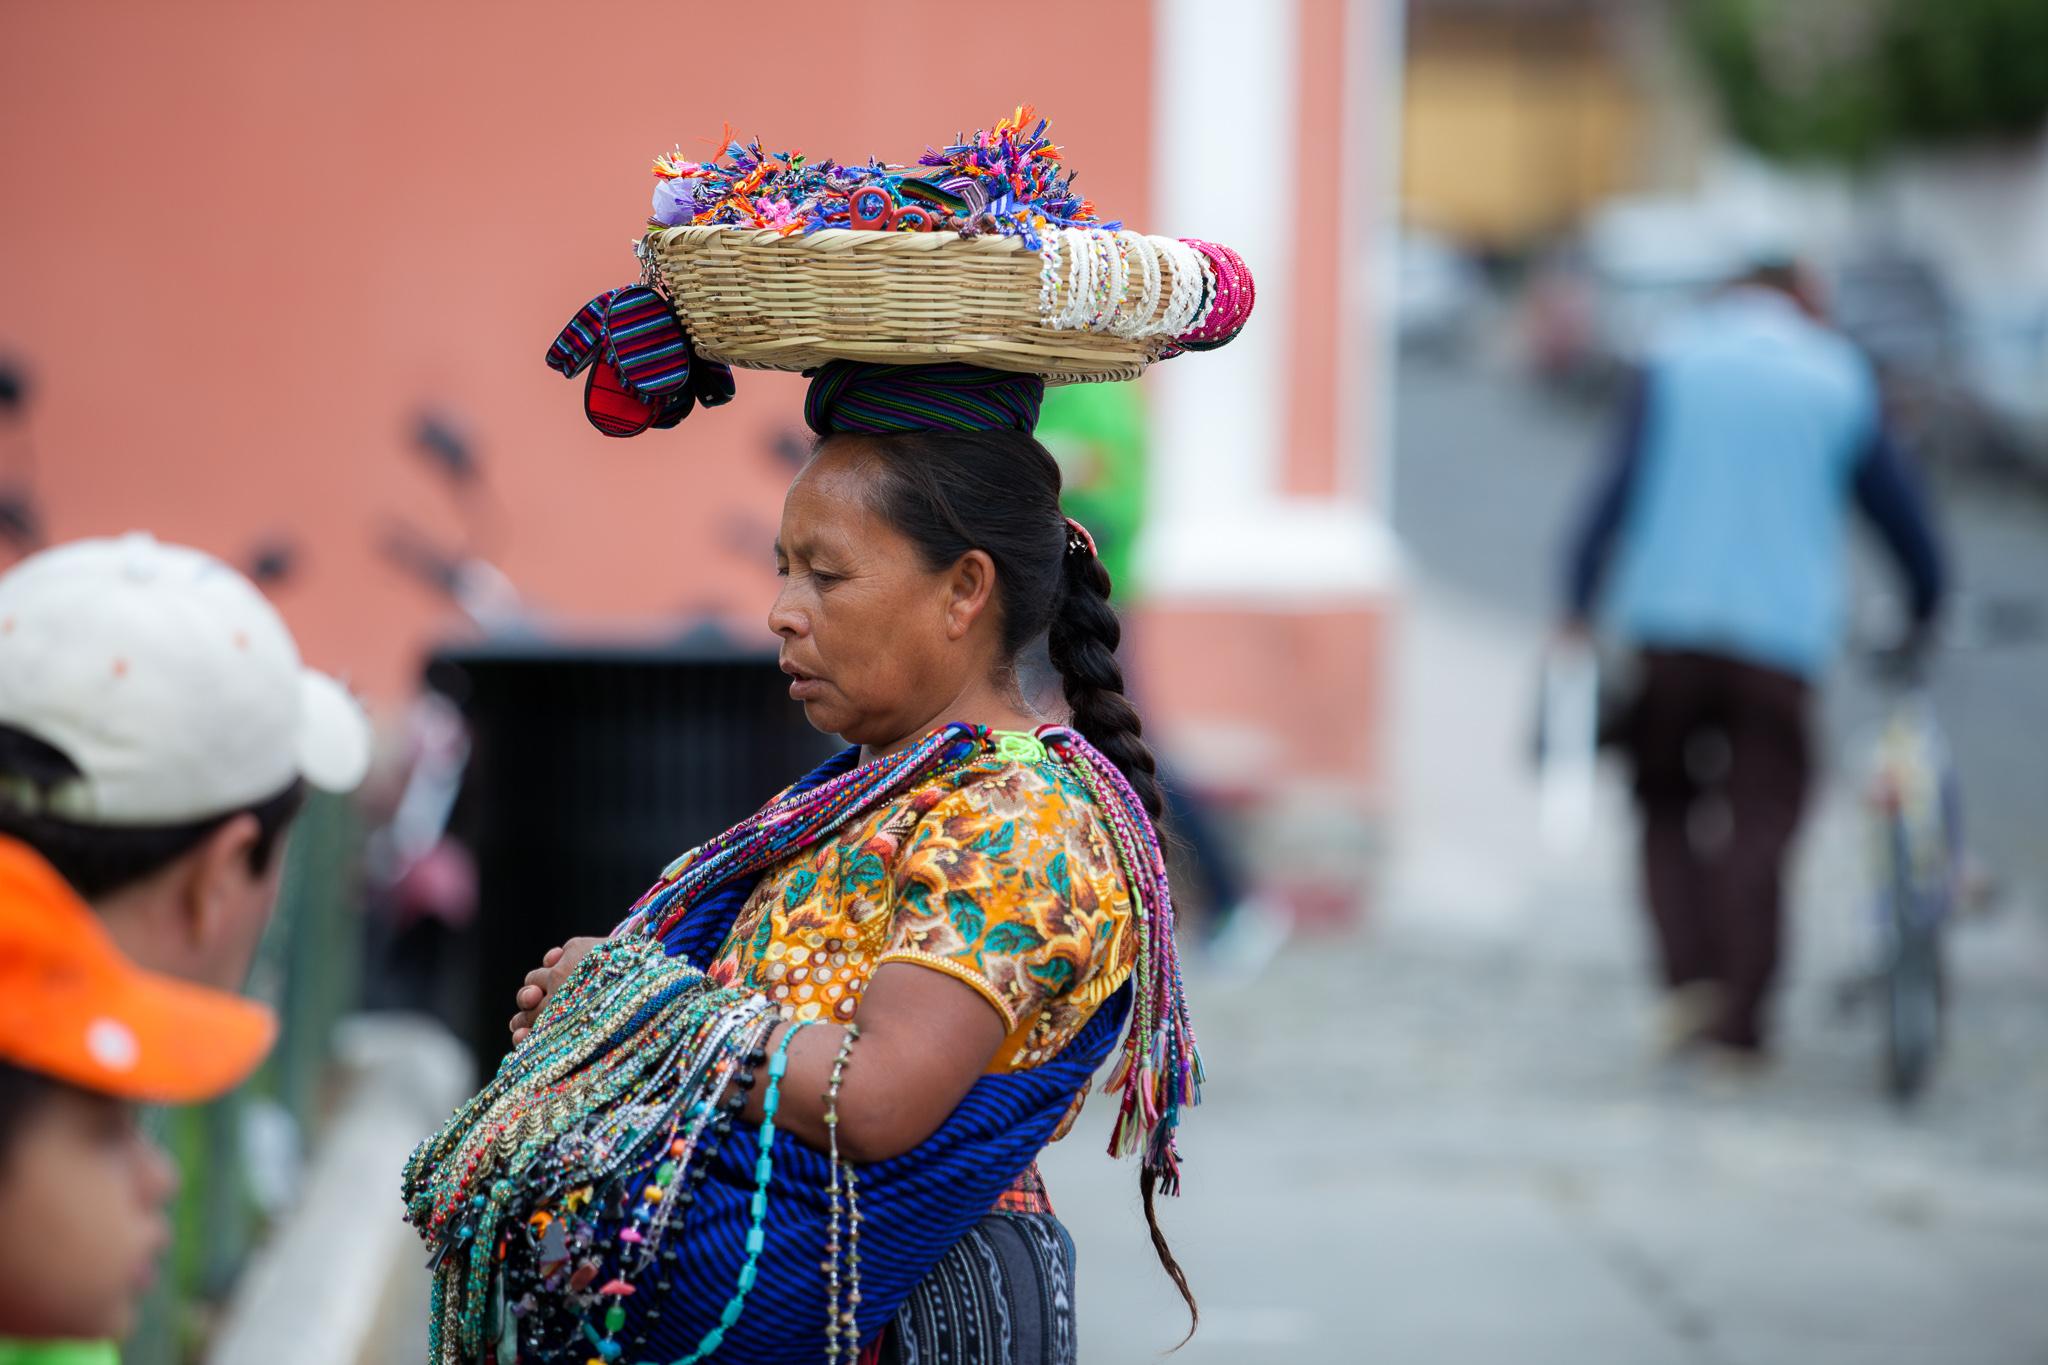 Guatemala-CP-160804-042.jpg